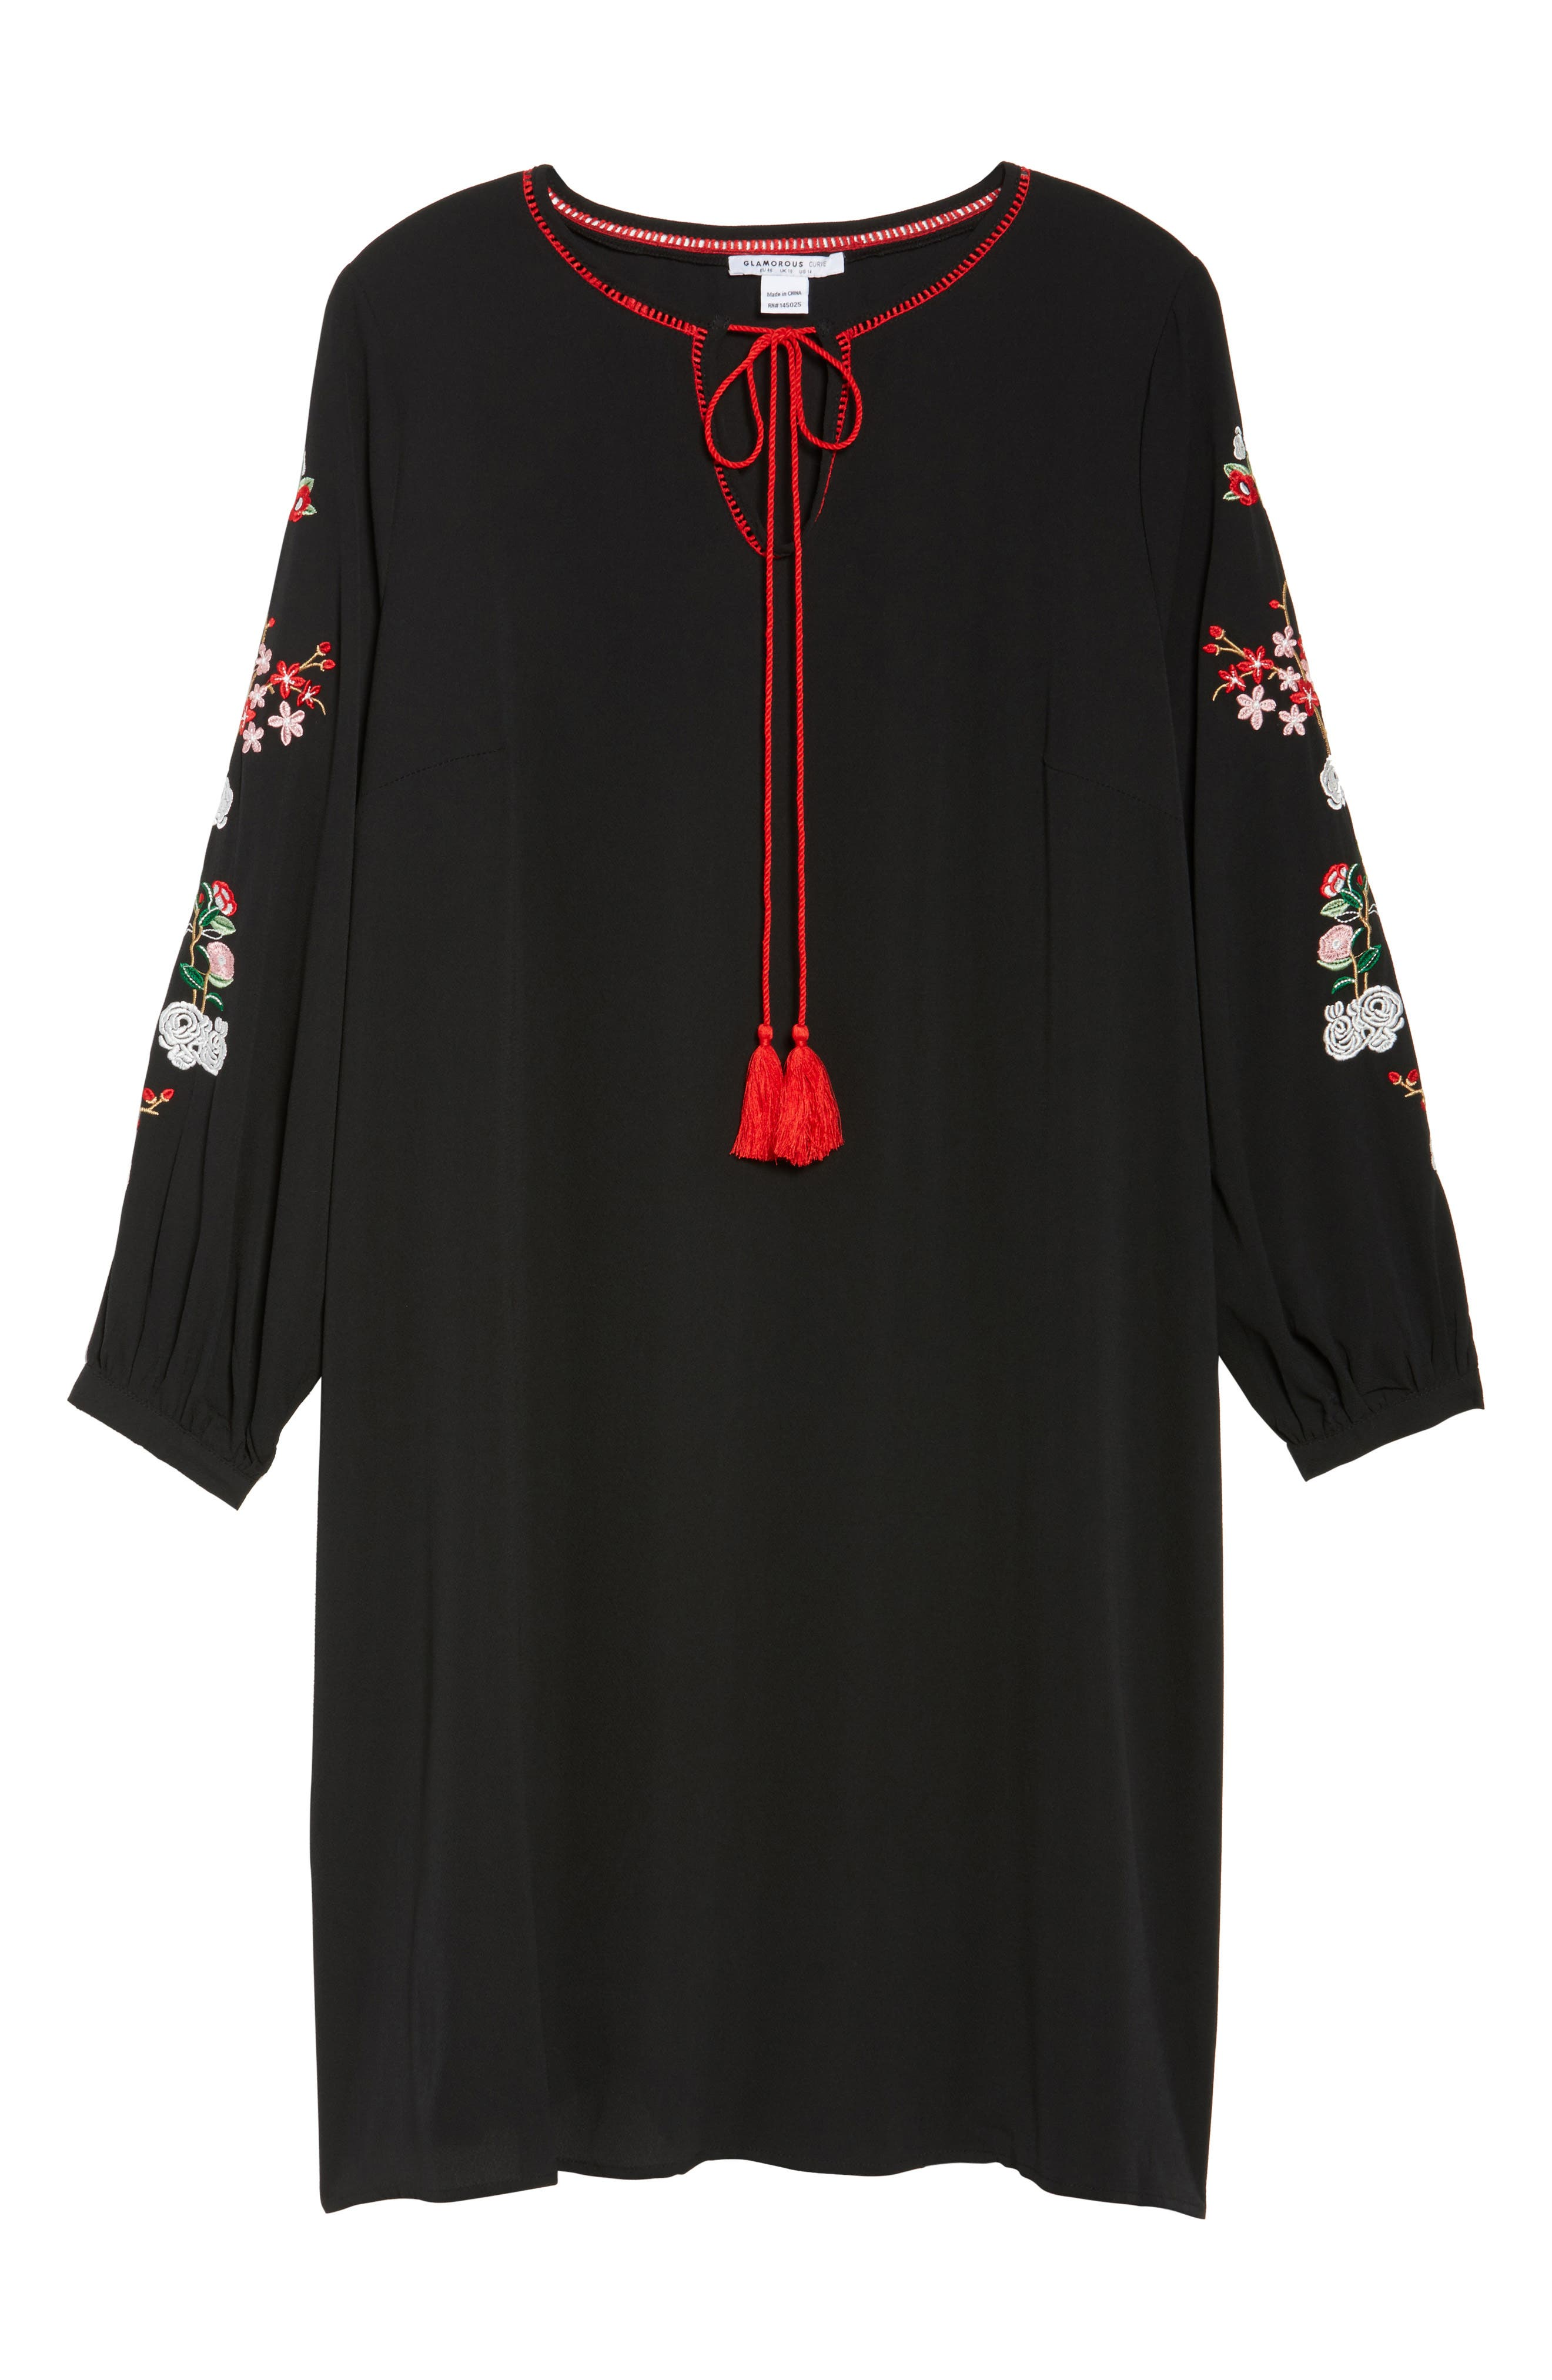 Floral Embroidered Shift Dress,                             Alternate thumbnail 6, color,                             Black